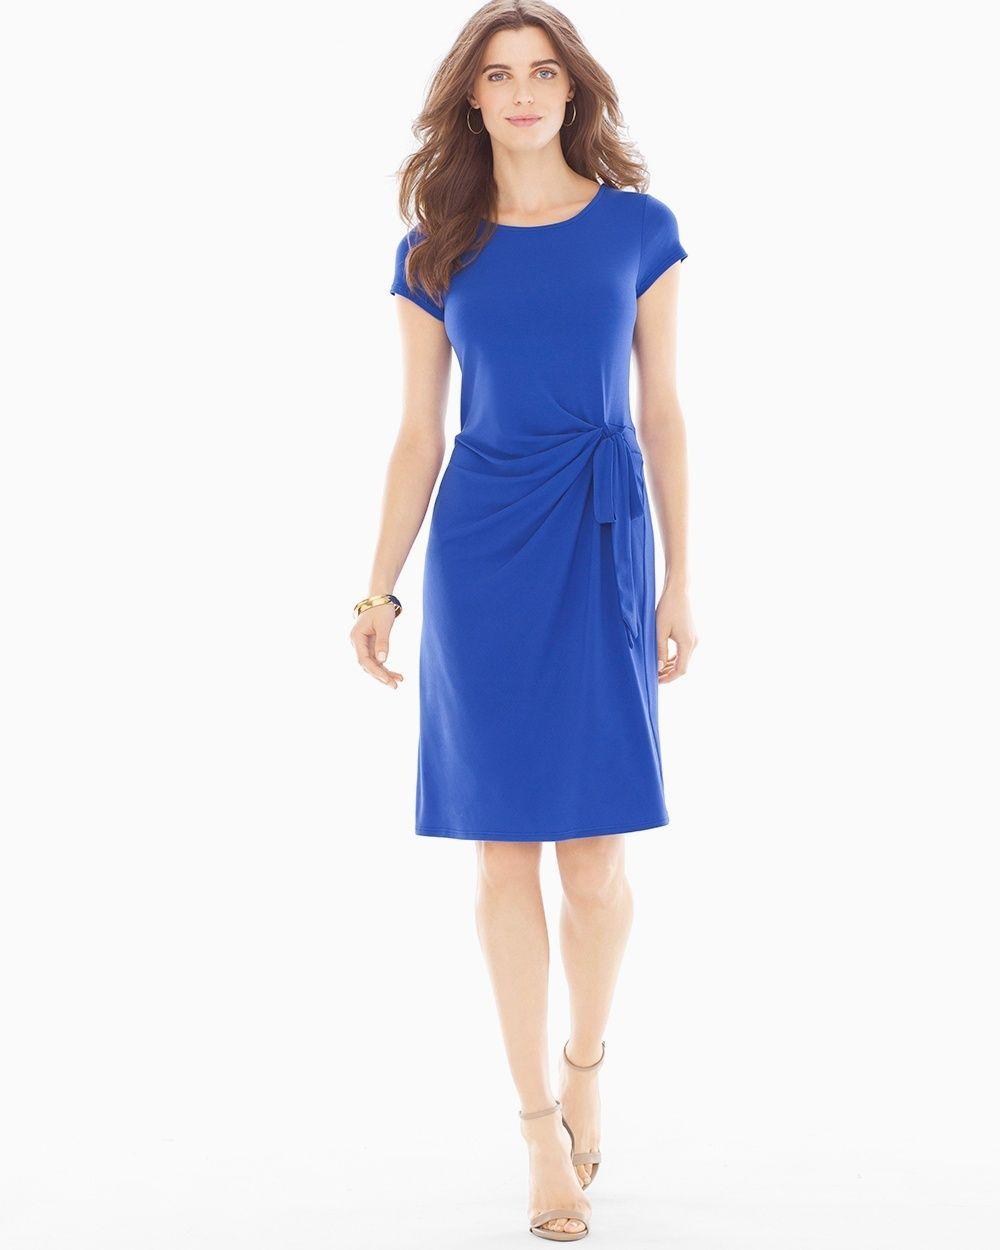 Soma leota short sleeve madison short dress size s libre short